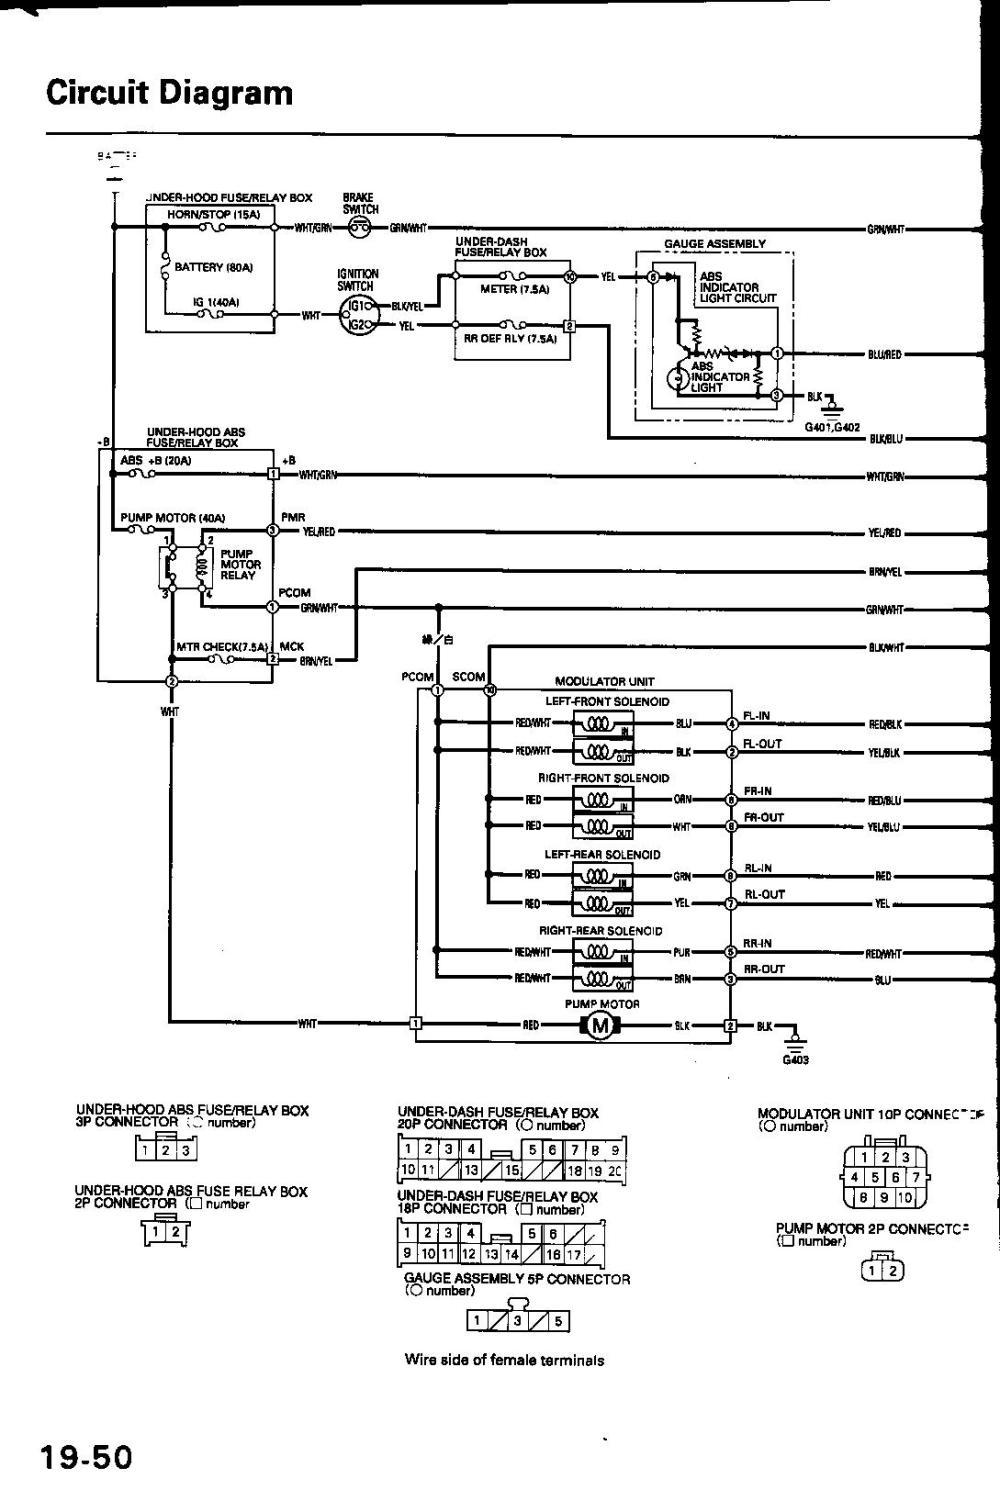 medium resolution of 1991 honda civic fuse box diagram 2000 honda civic fuse box 2000 honda civic fuse diagram